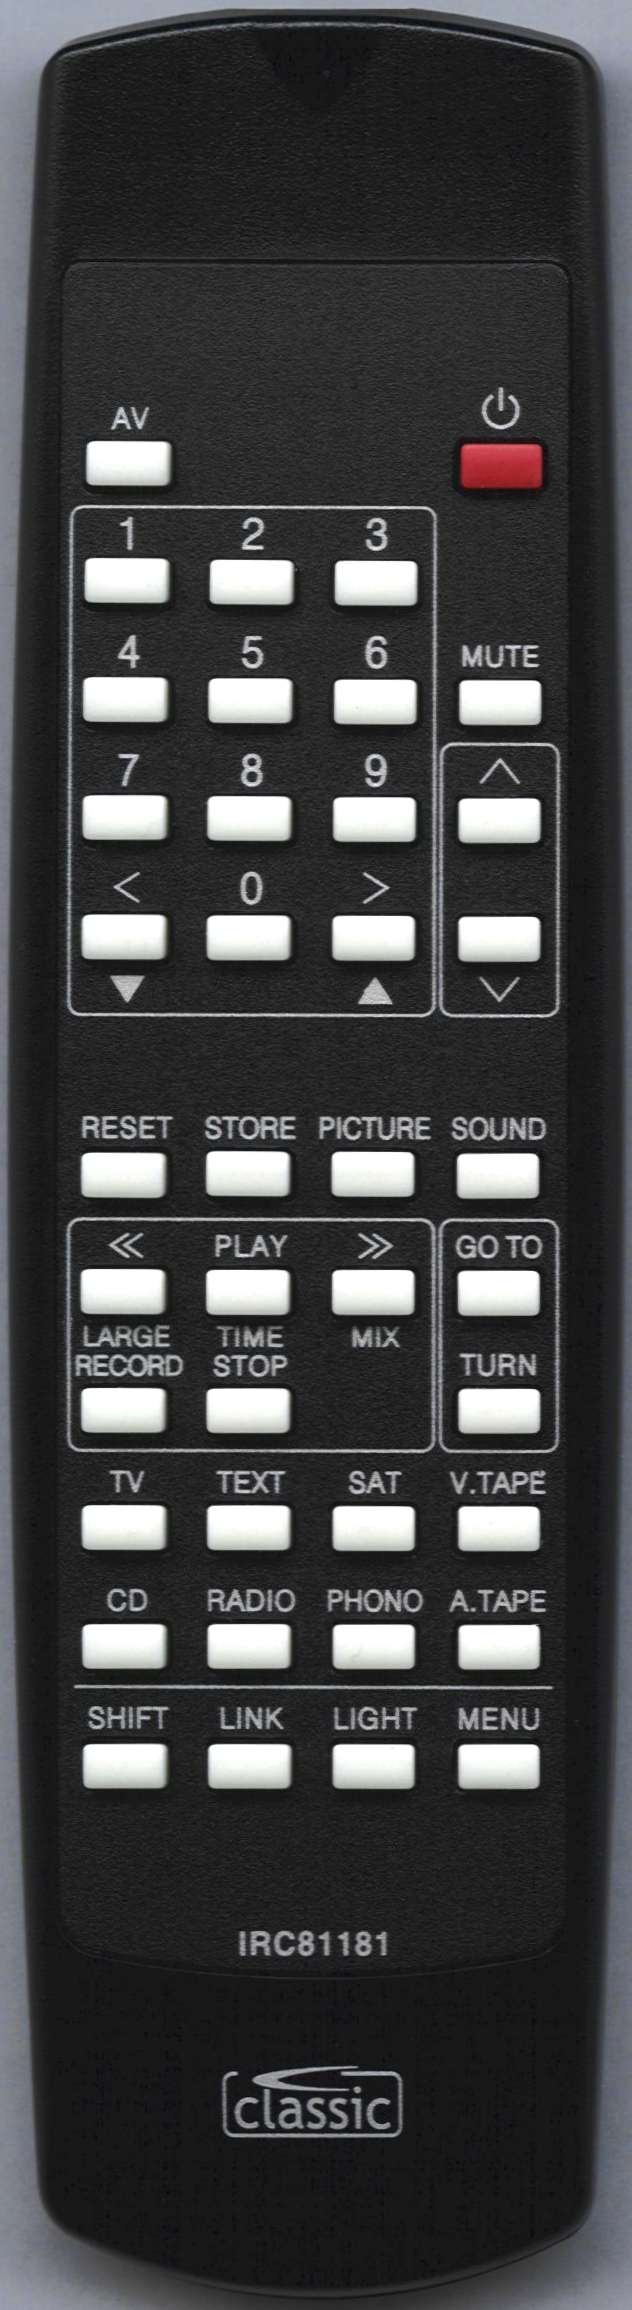 Bang & Olufsen 8007731 Remote Control